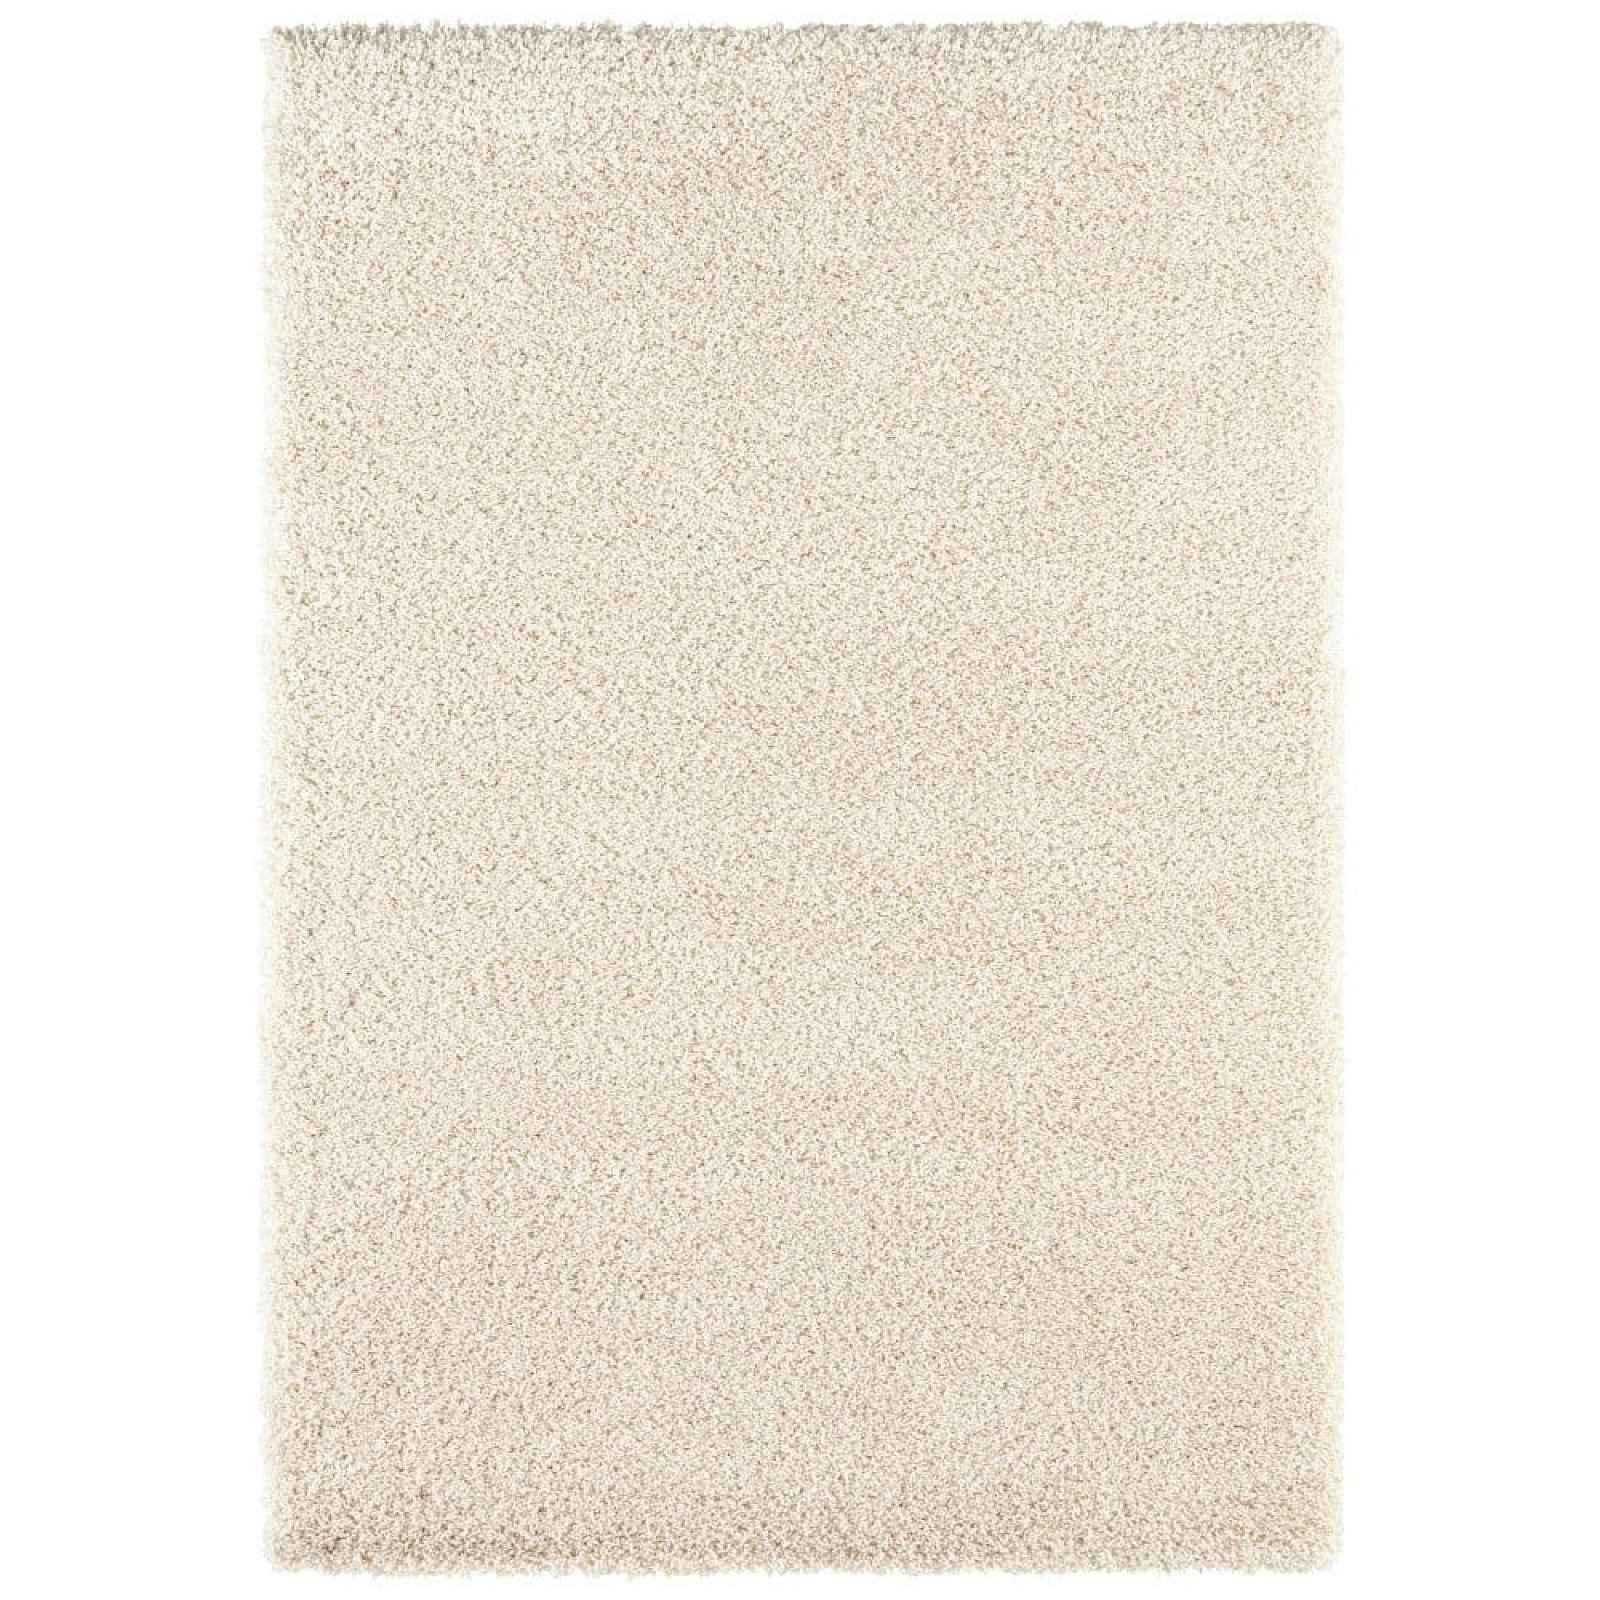 Světle krémový koberec Elle Decor Lovely Talence, 140 x 200 cm